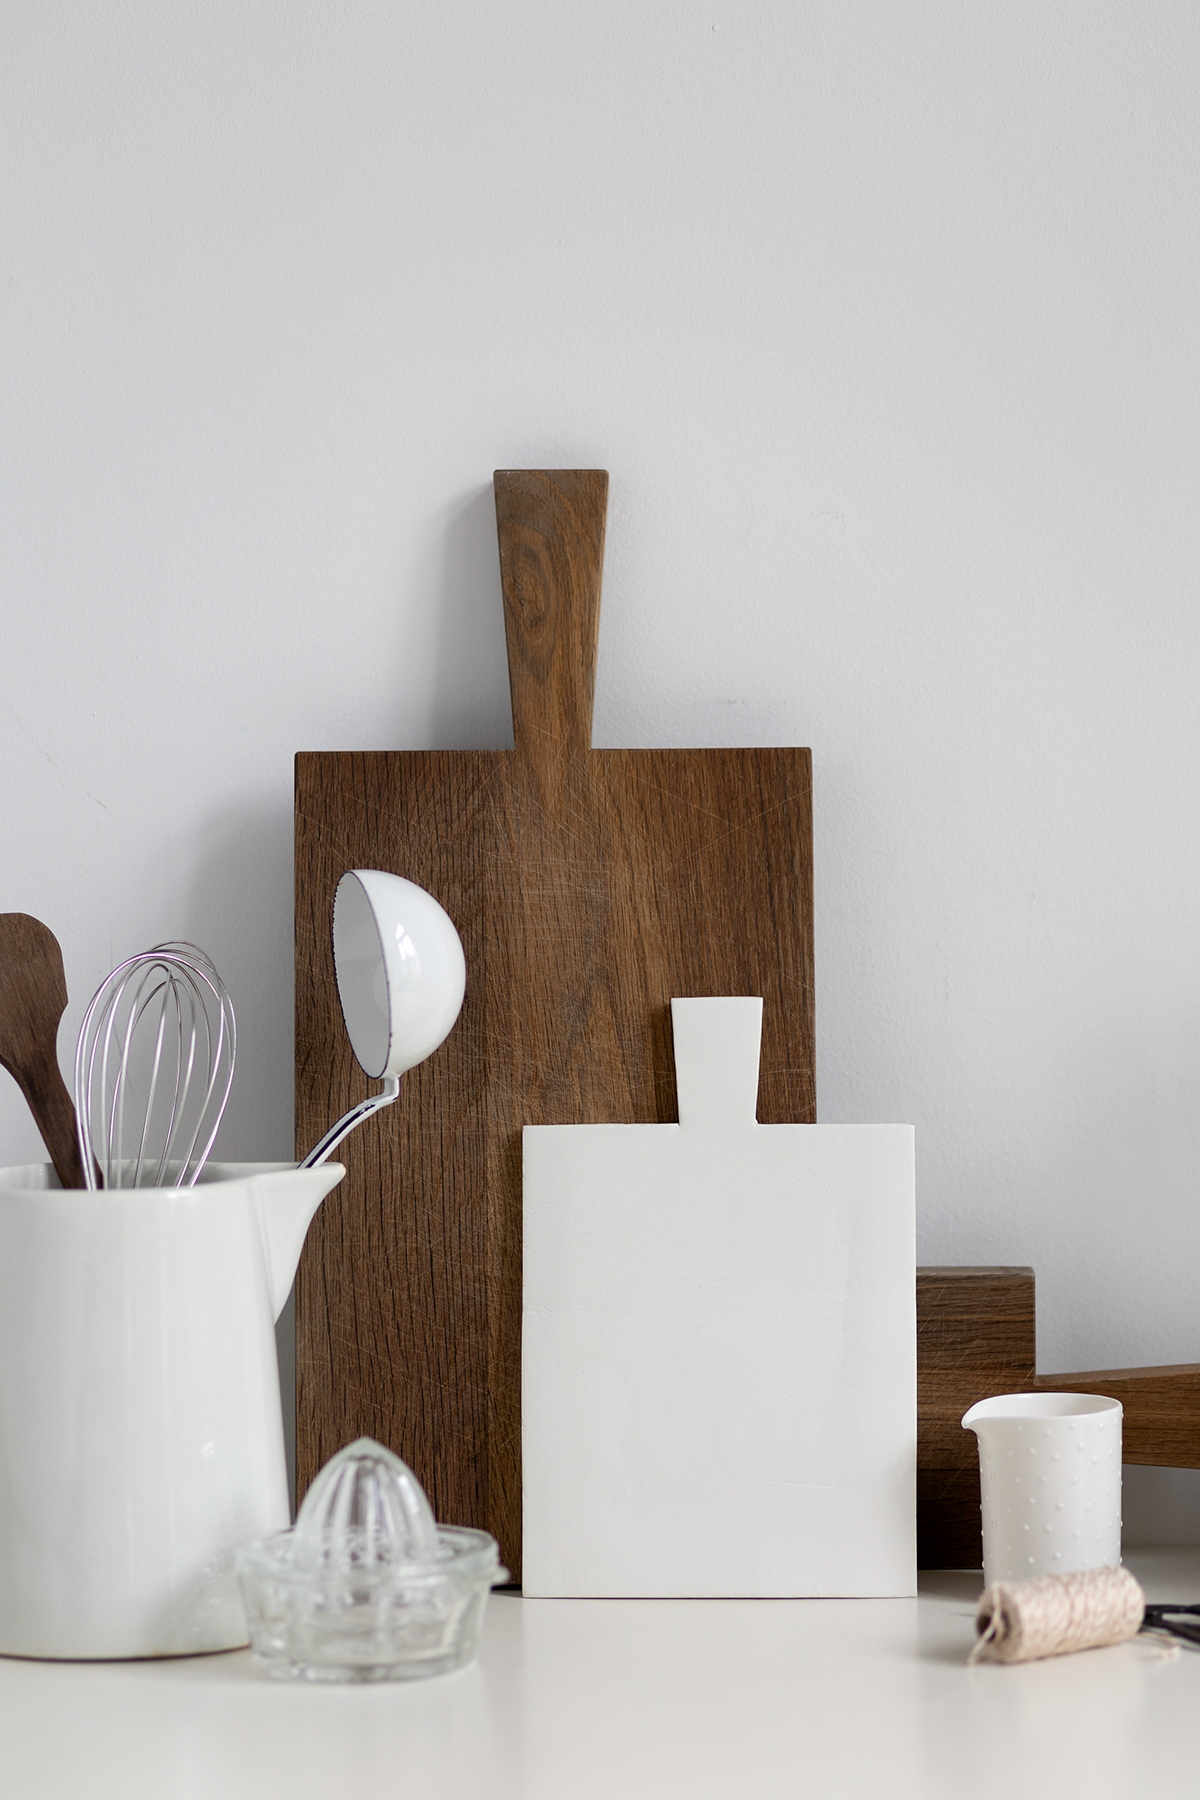 Selber Machen: Dekobrett aus Modelliermasse - komplette DIY-Anleitung | we love handmade